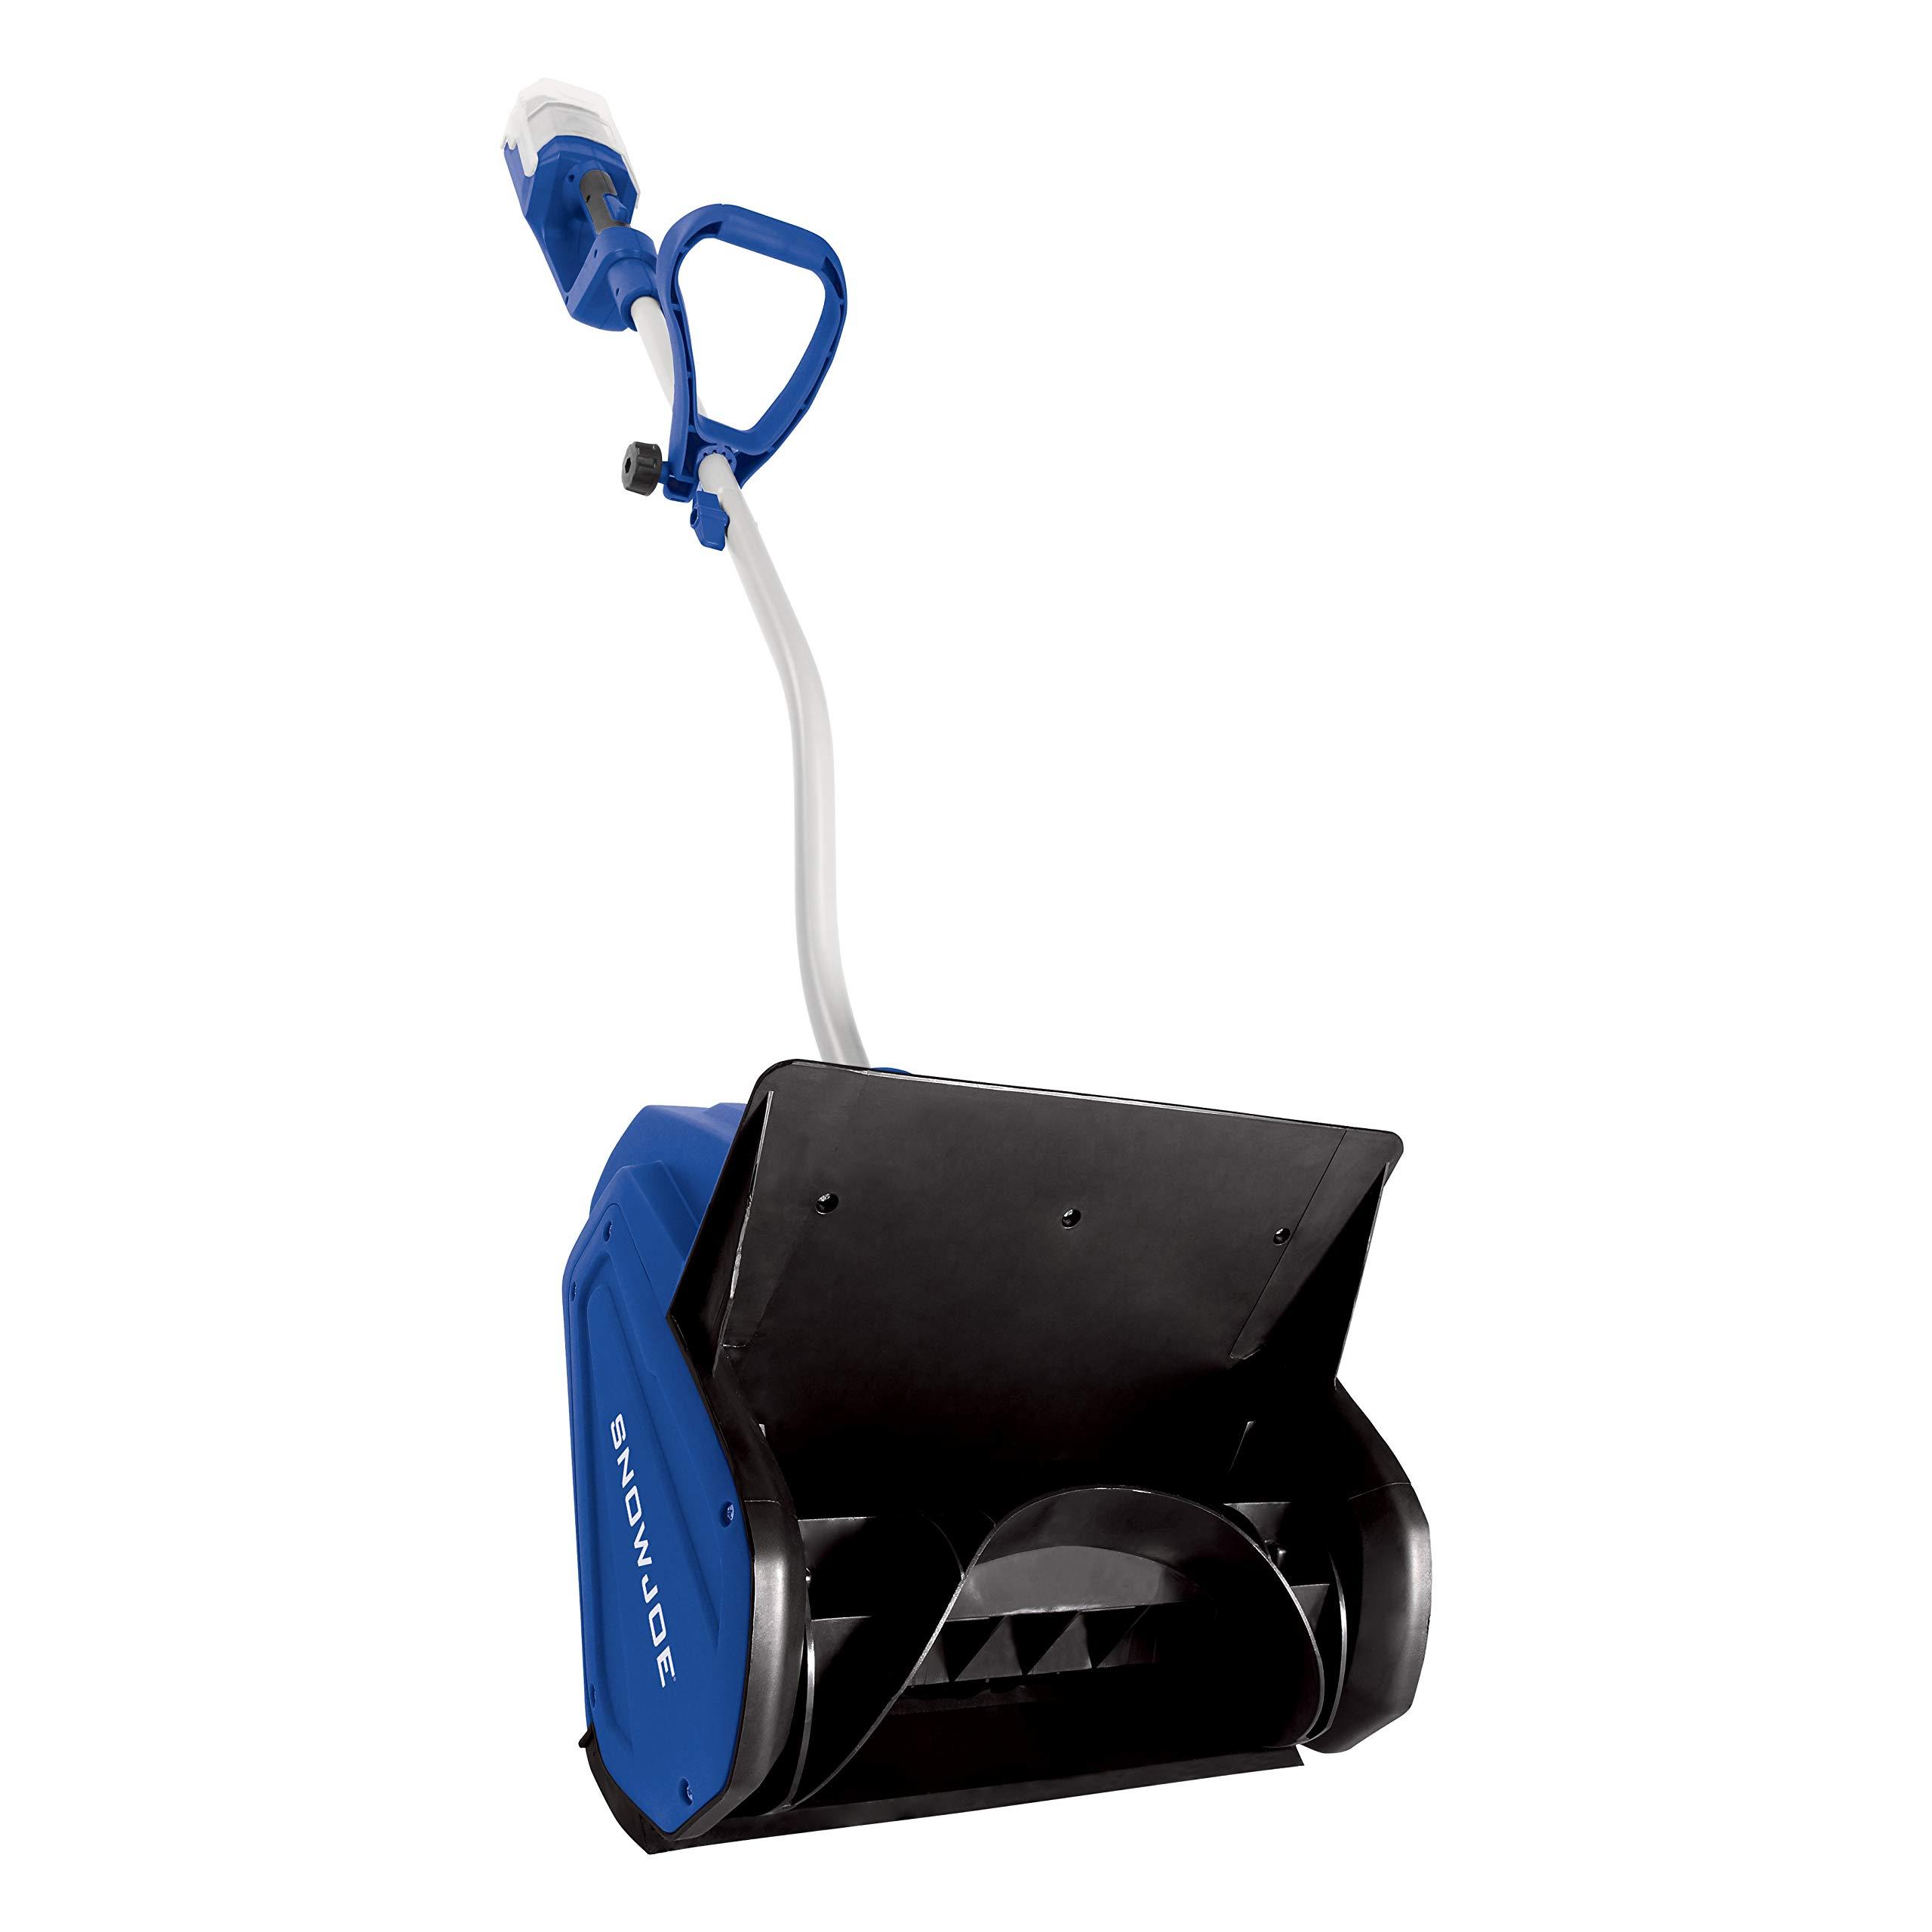 Snow Joe iON13SS Cordless Snow Shovel | 13-Inch | 4 Ah Battery | 40 Volt | Brushless product image